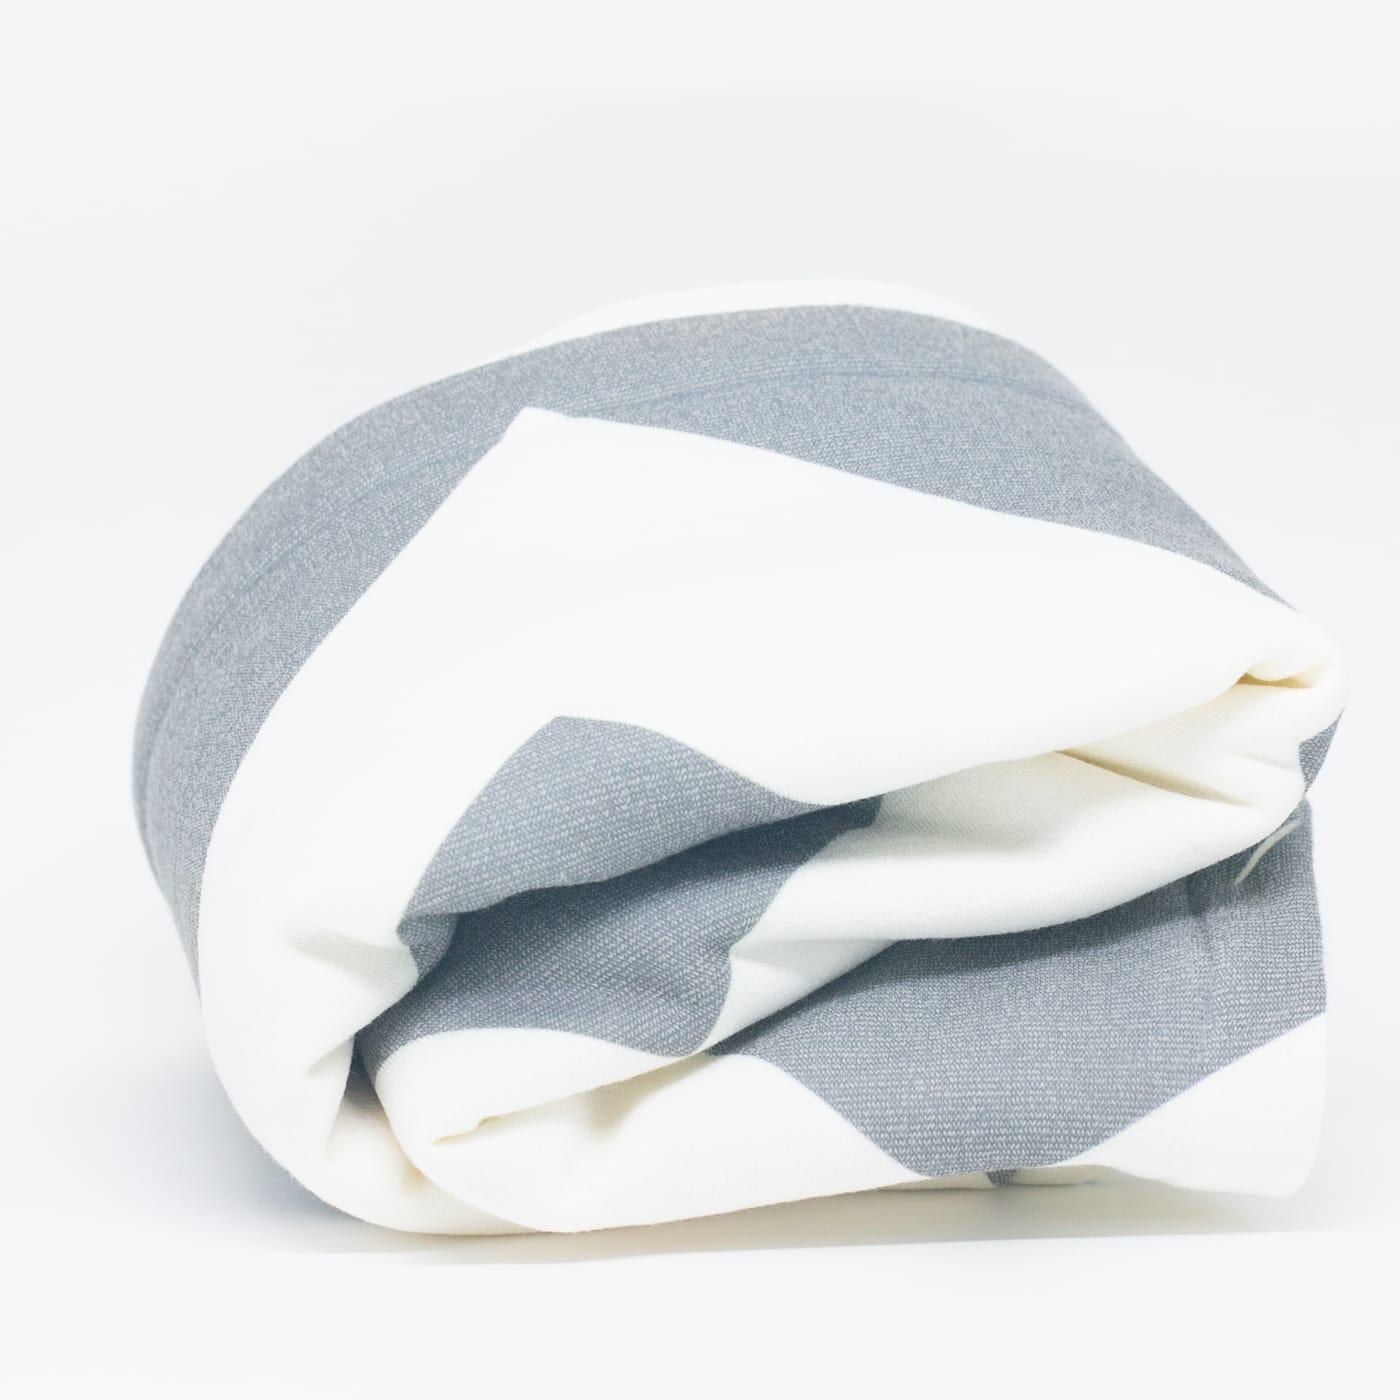 cobertor em pattern topper - 14 opções de cores